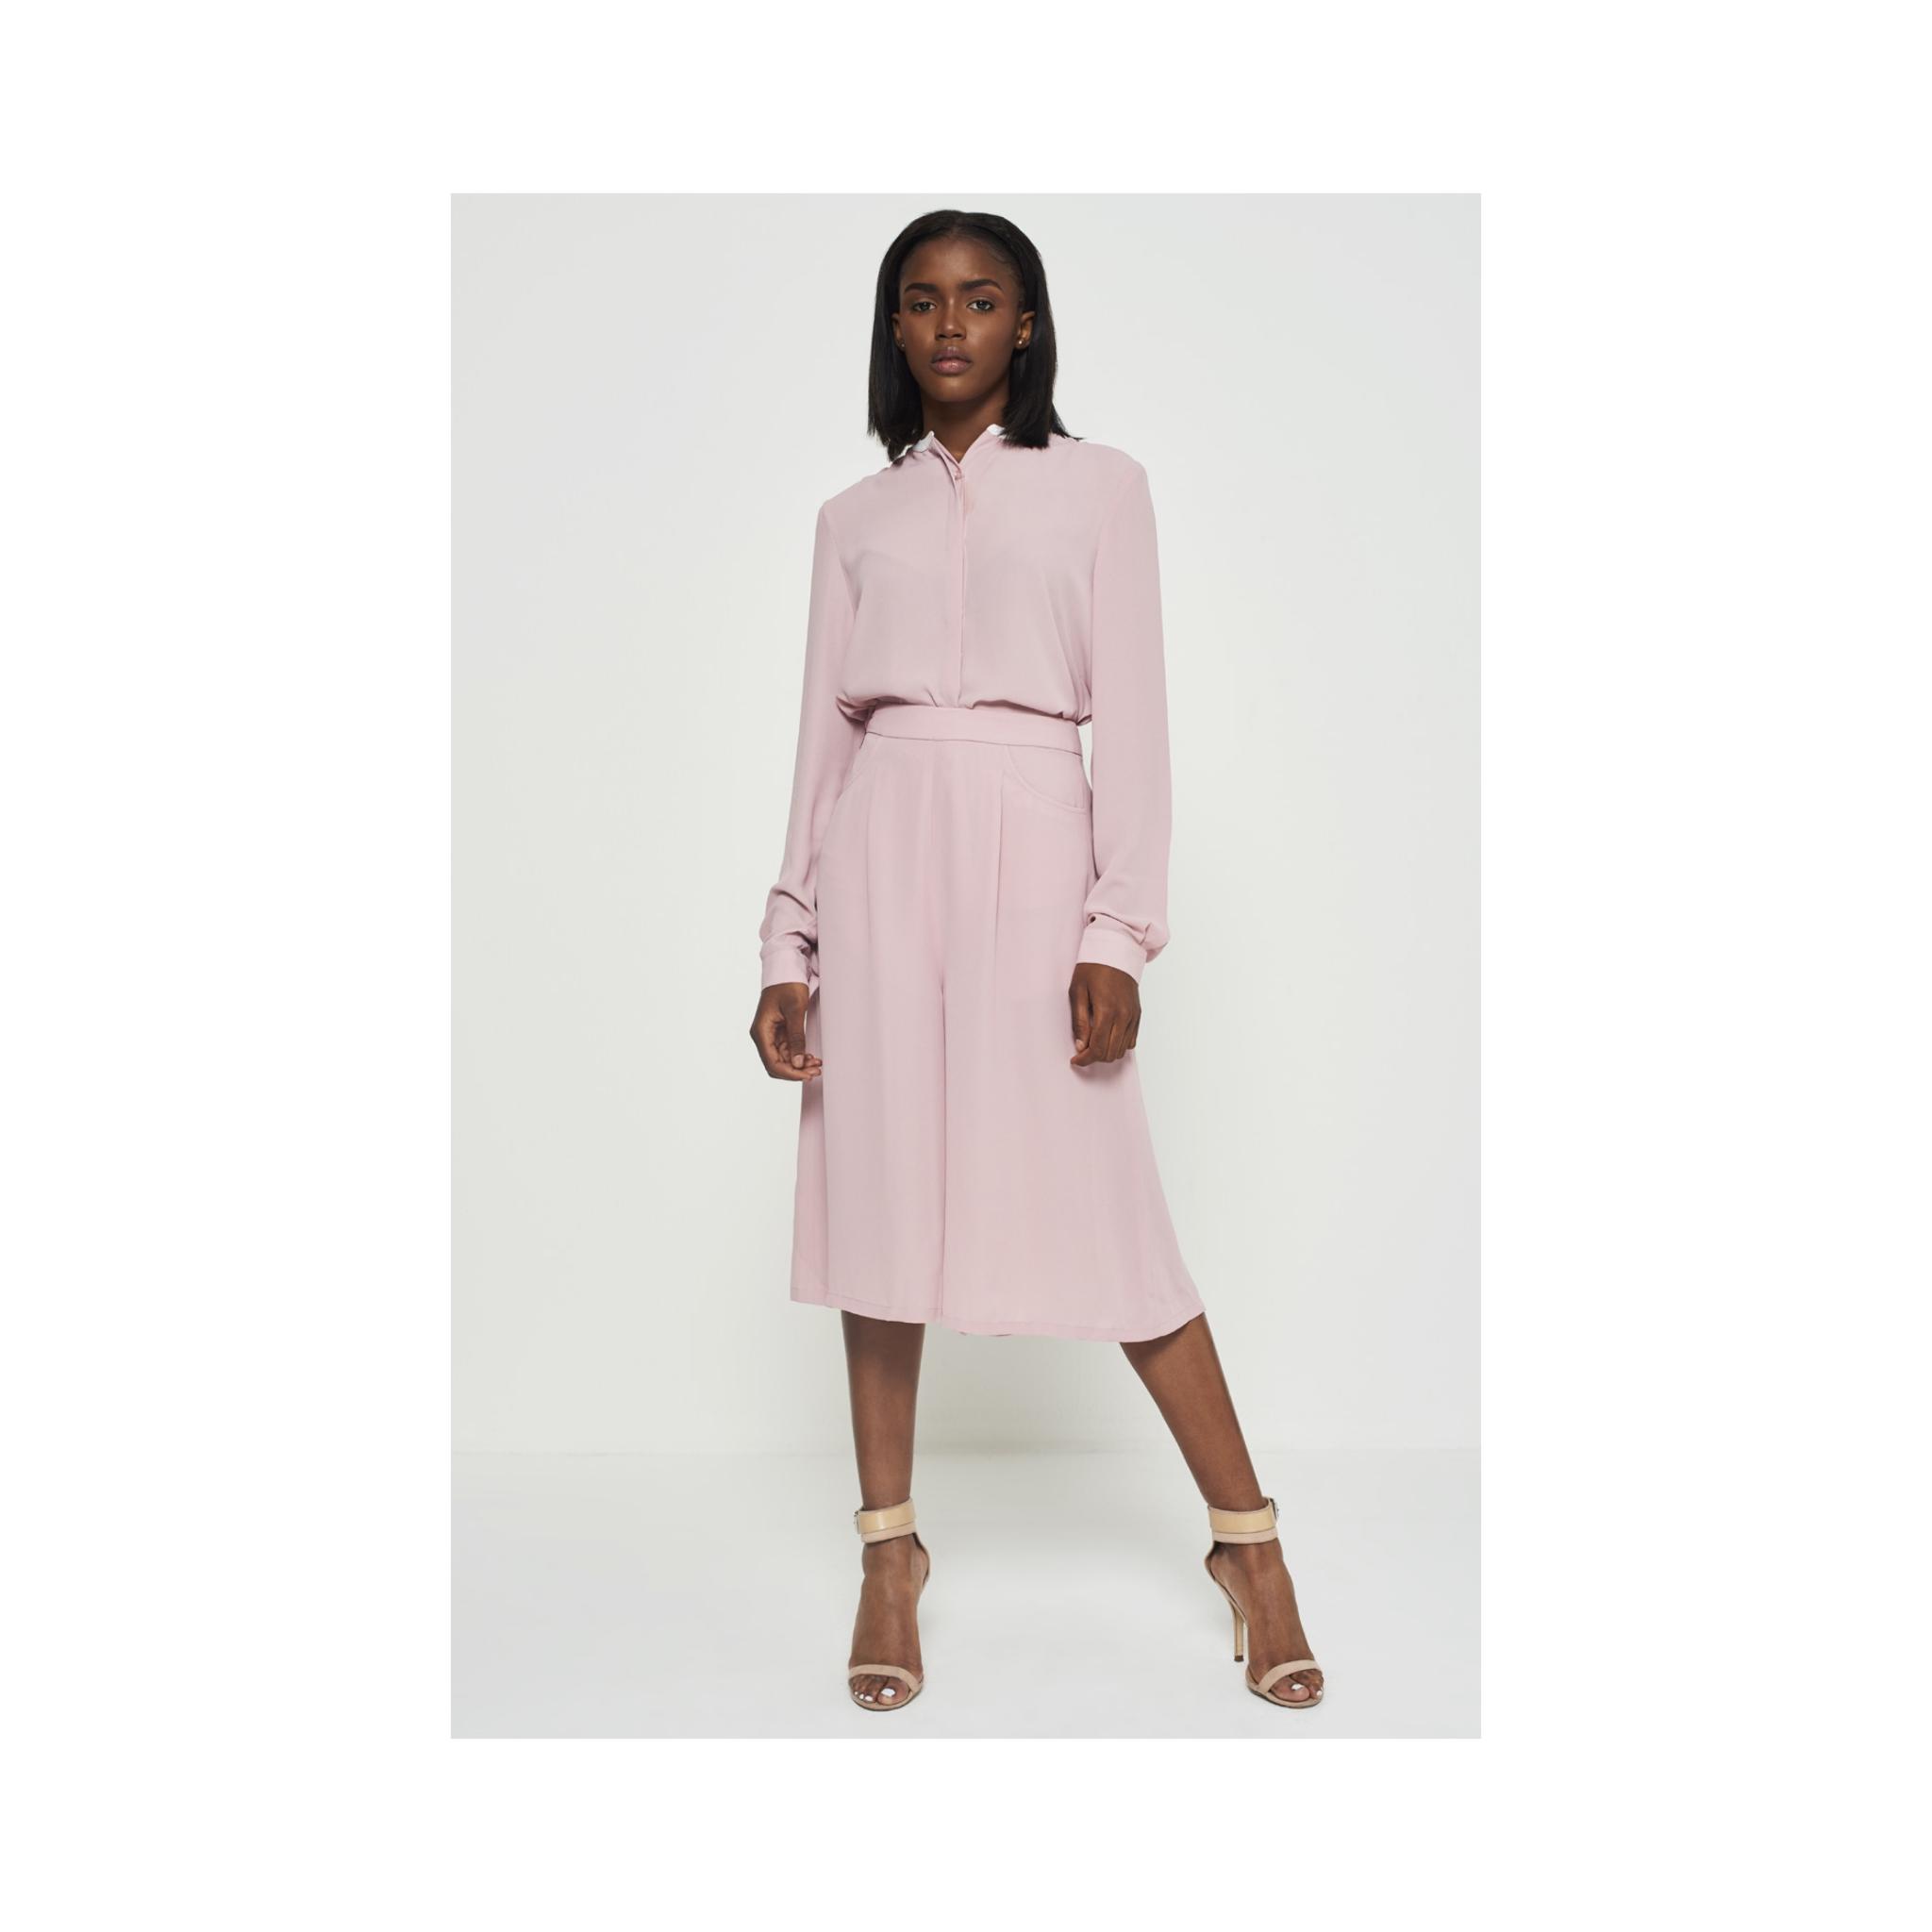 87Origins Culottes Pink.jpg